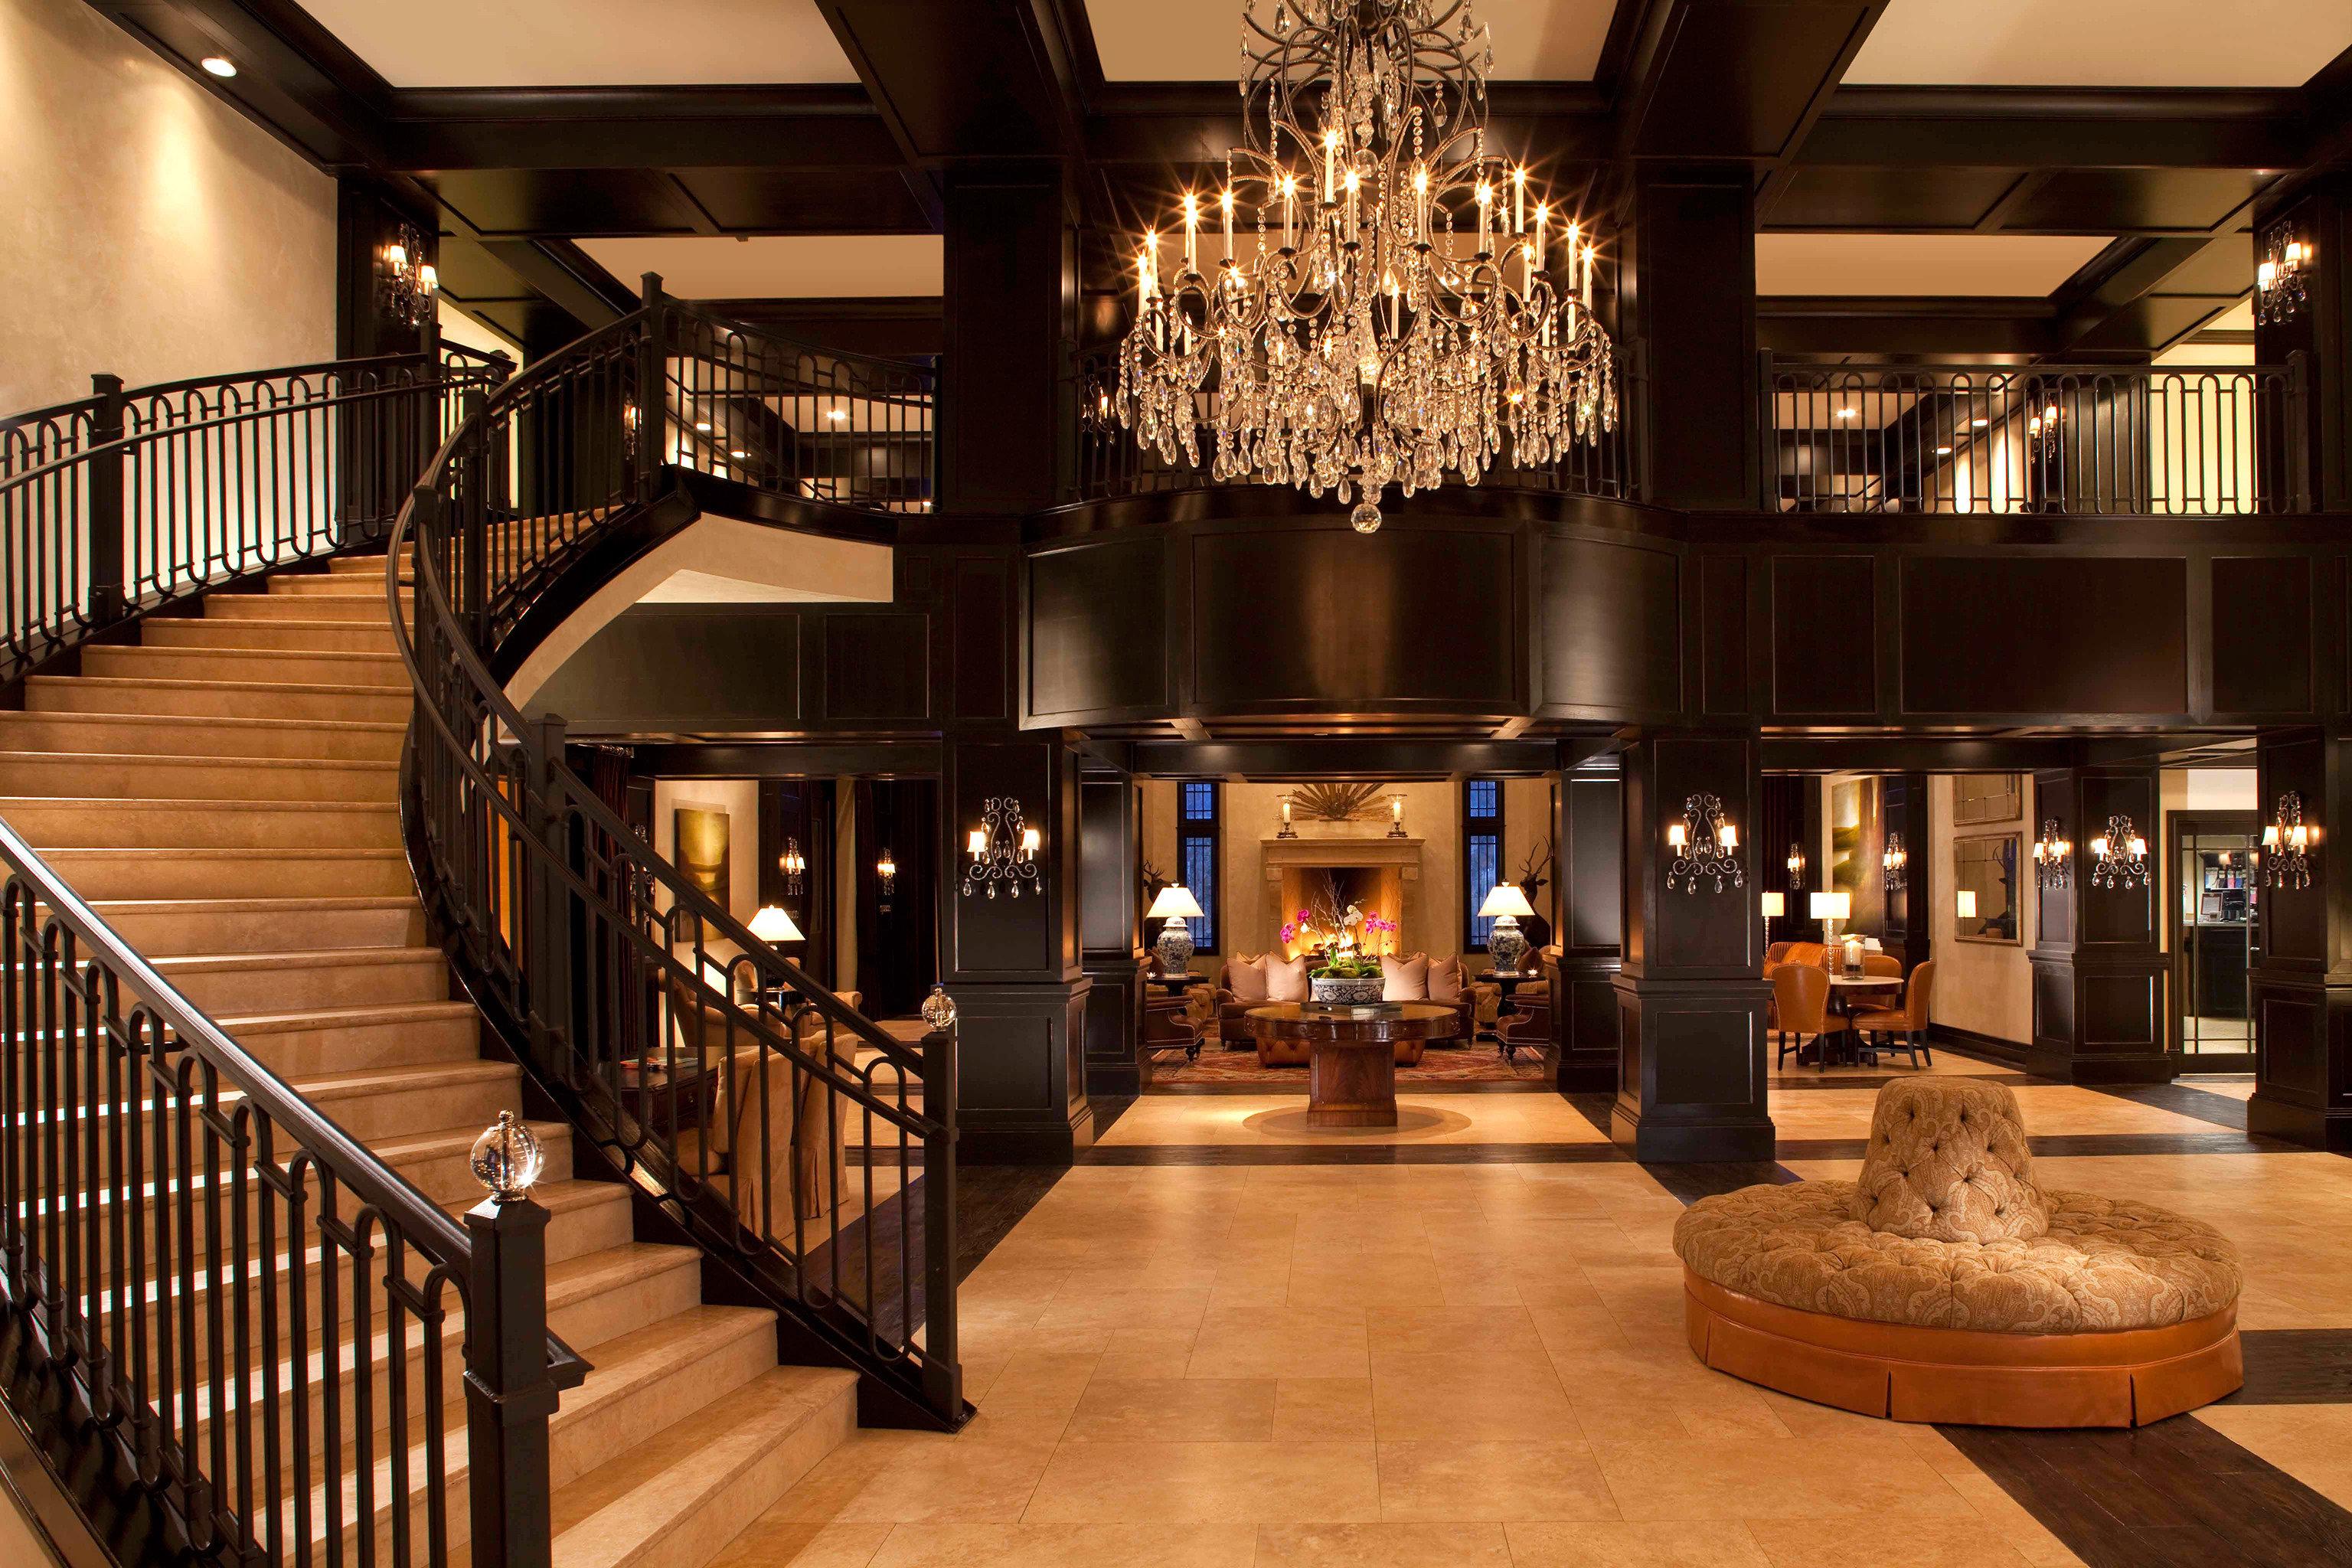 Fireplace Lounge Luxury Winery lighting Bar Lobby